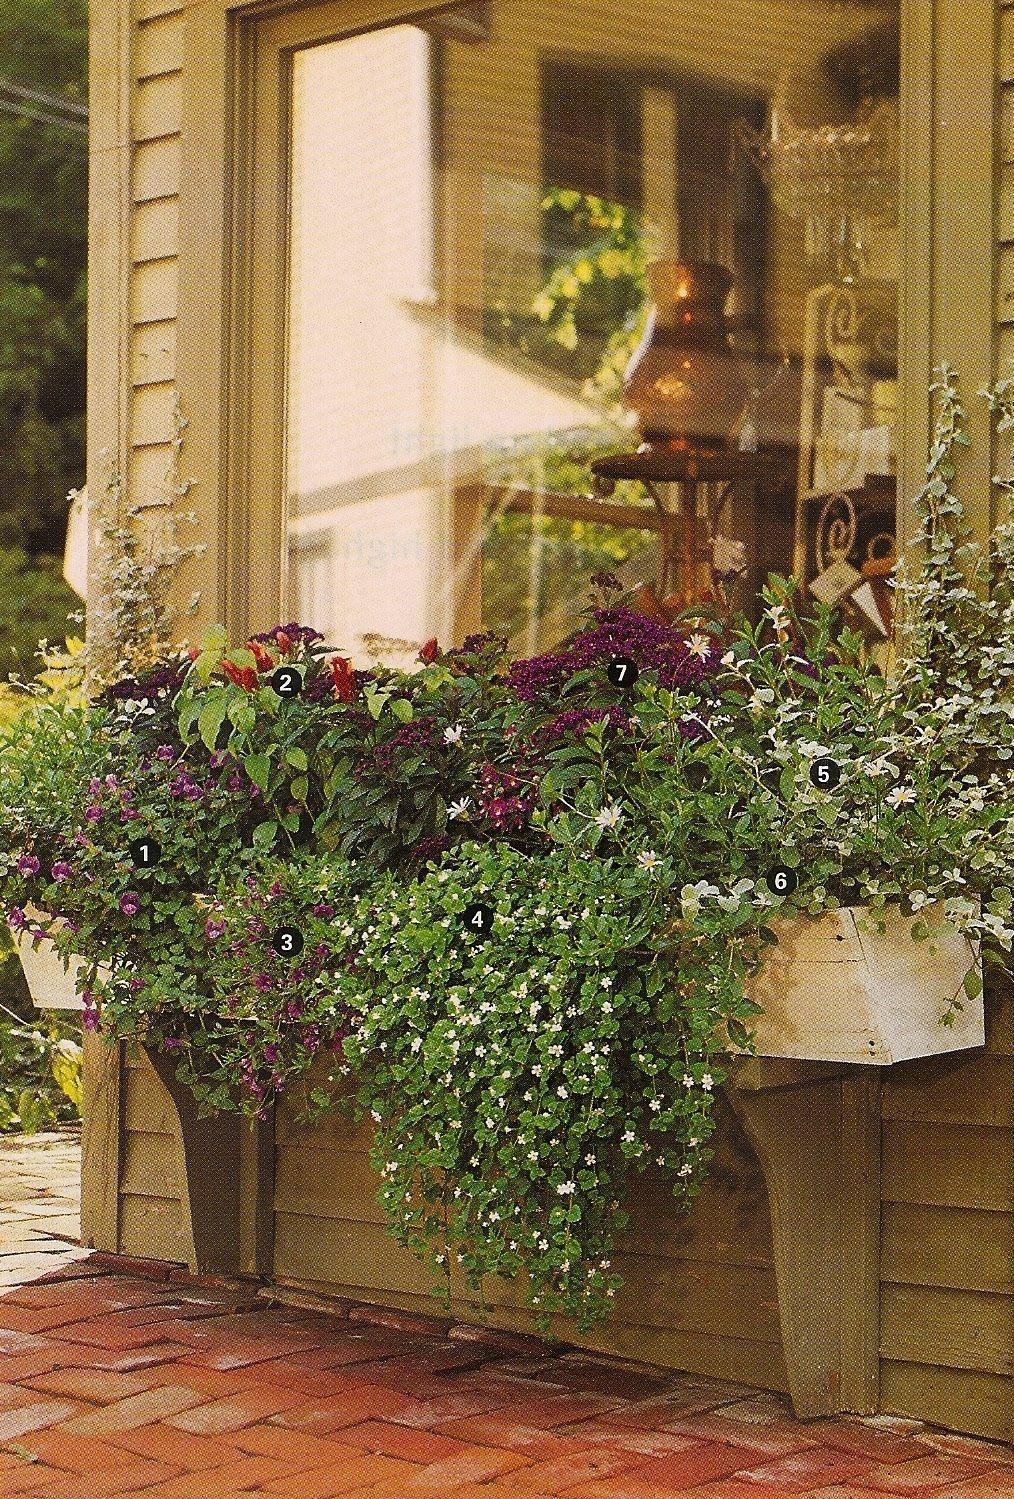 design dump | In the Garden | Pinterest | Gardens